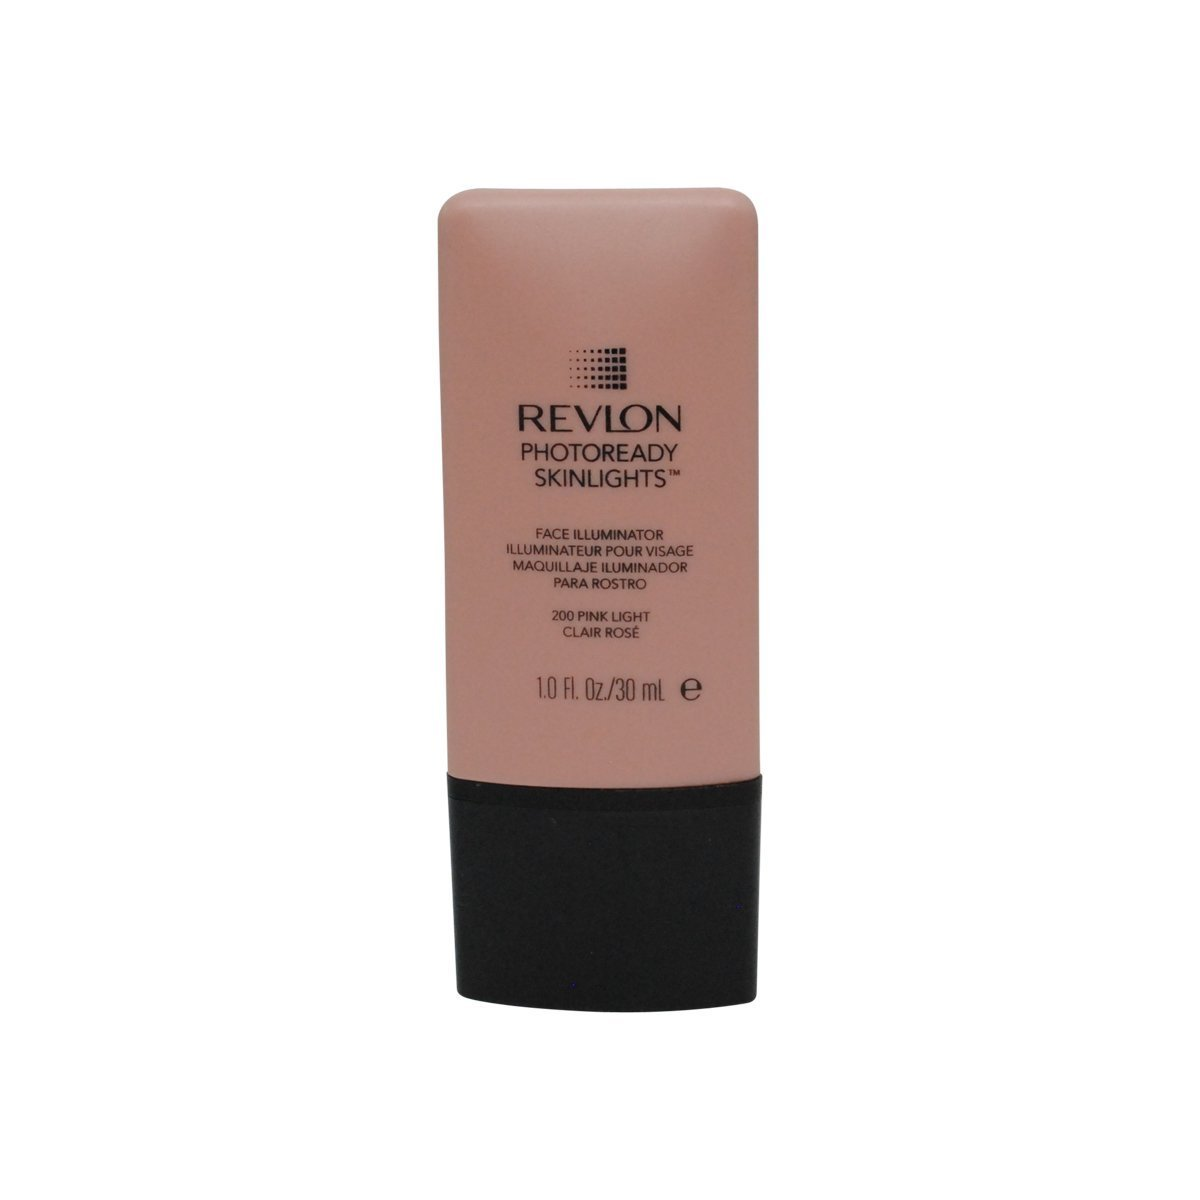 Buy Revlon PhotoReady Skinlights Face